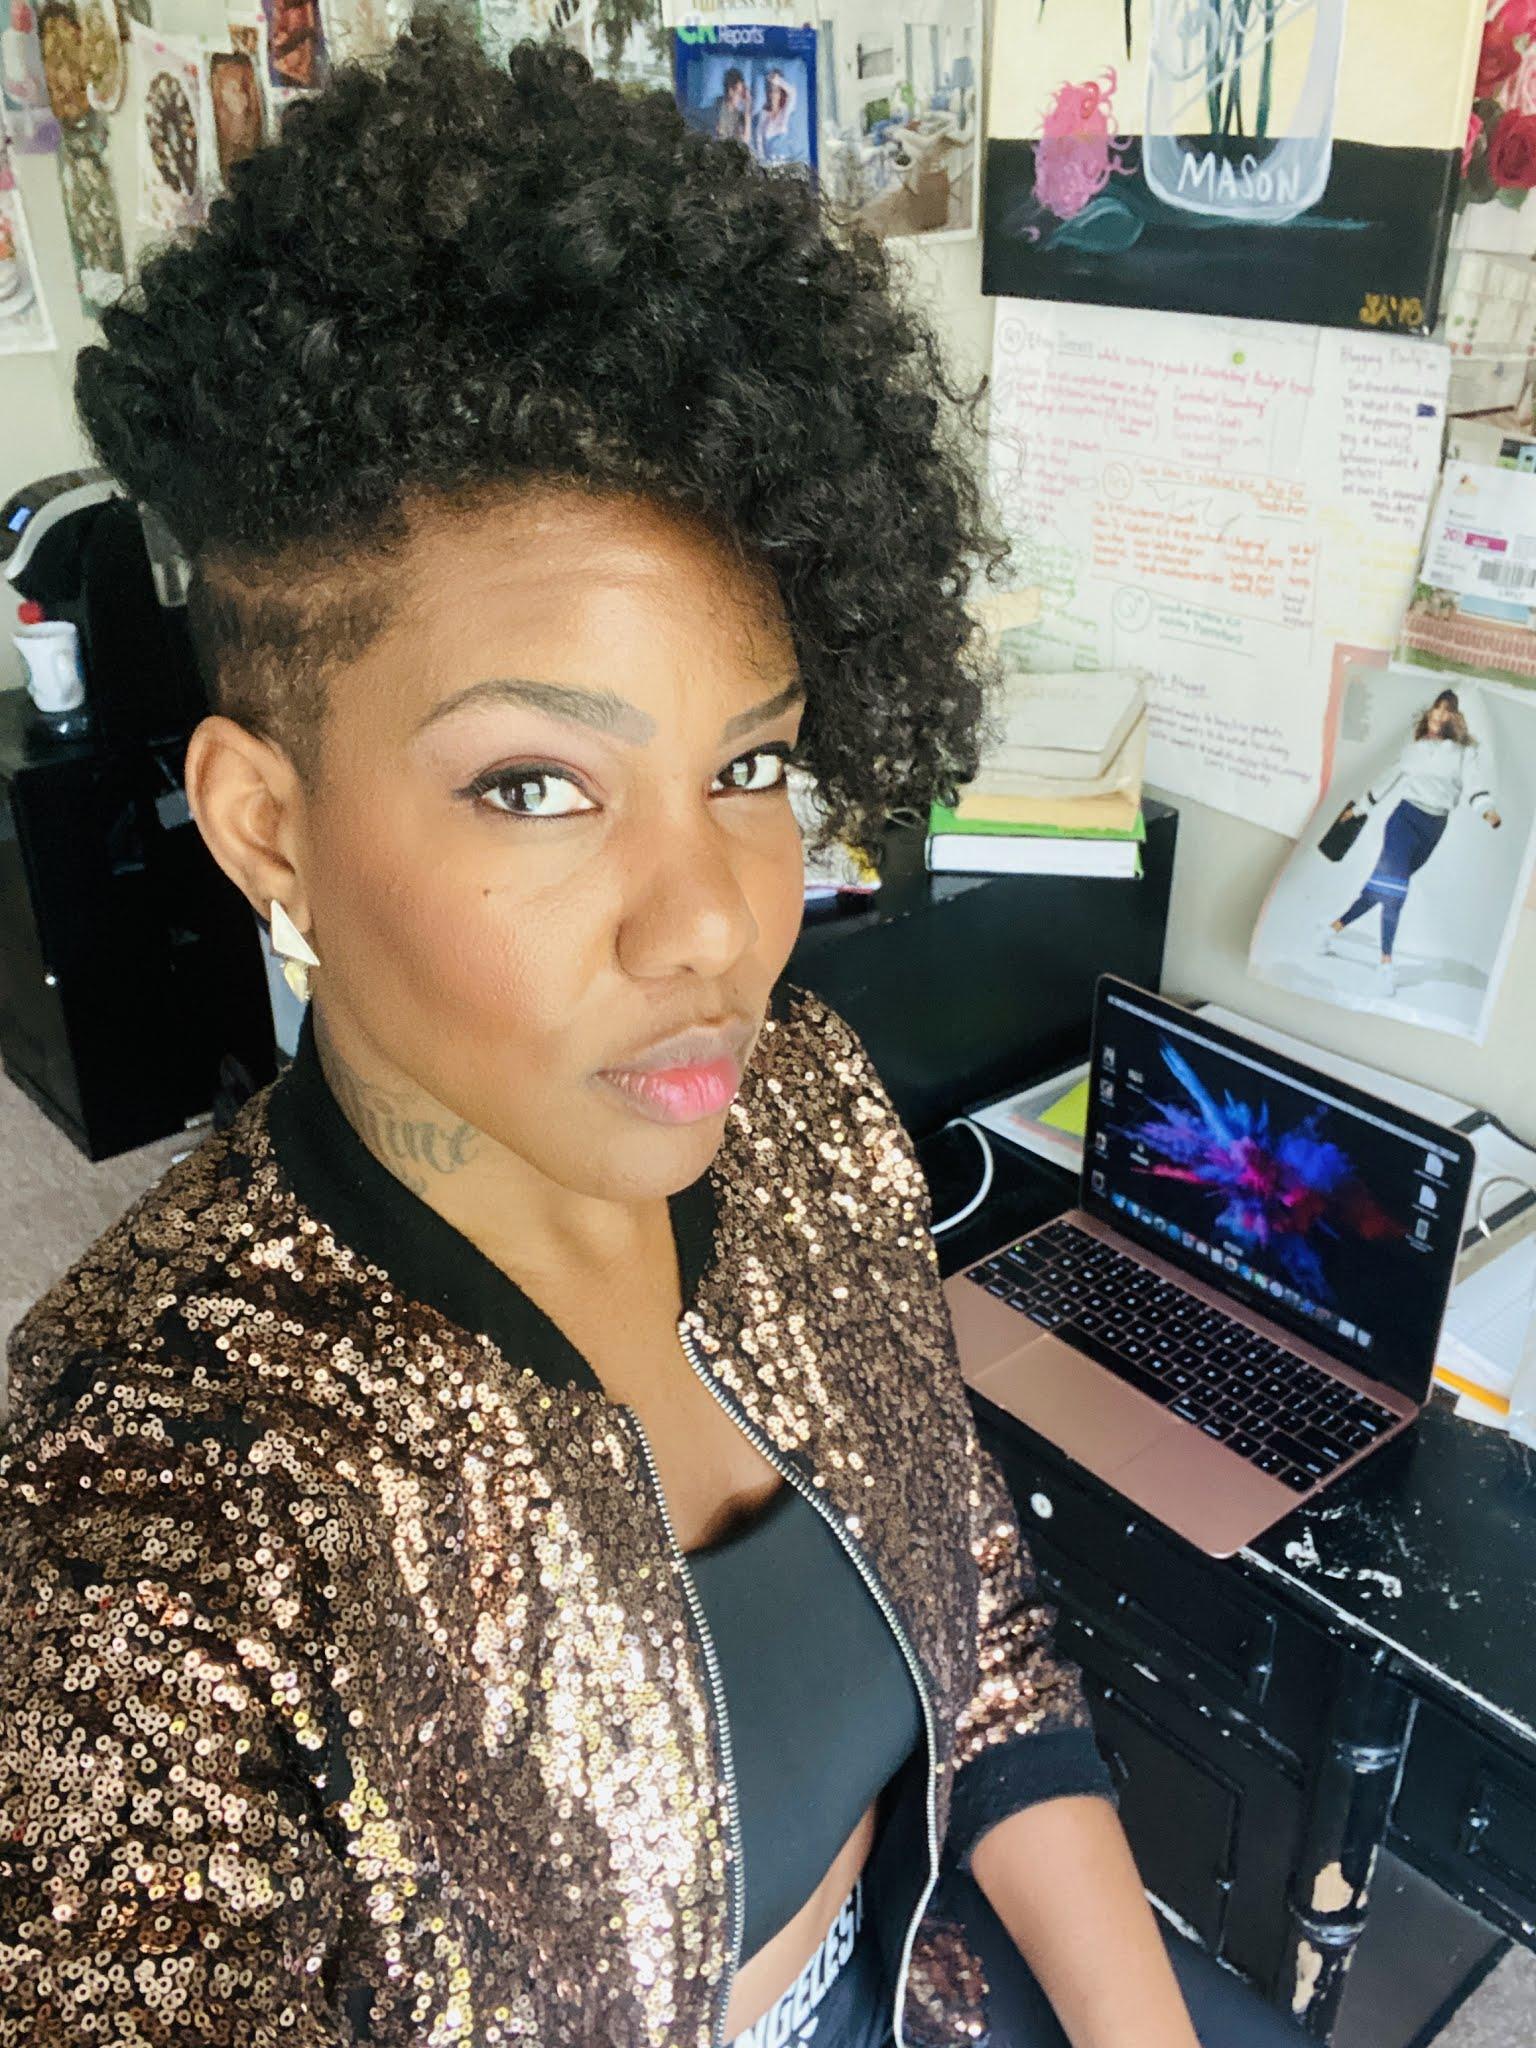 Planning A Virtual Natural Hair Meet-Up